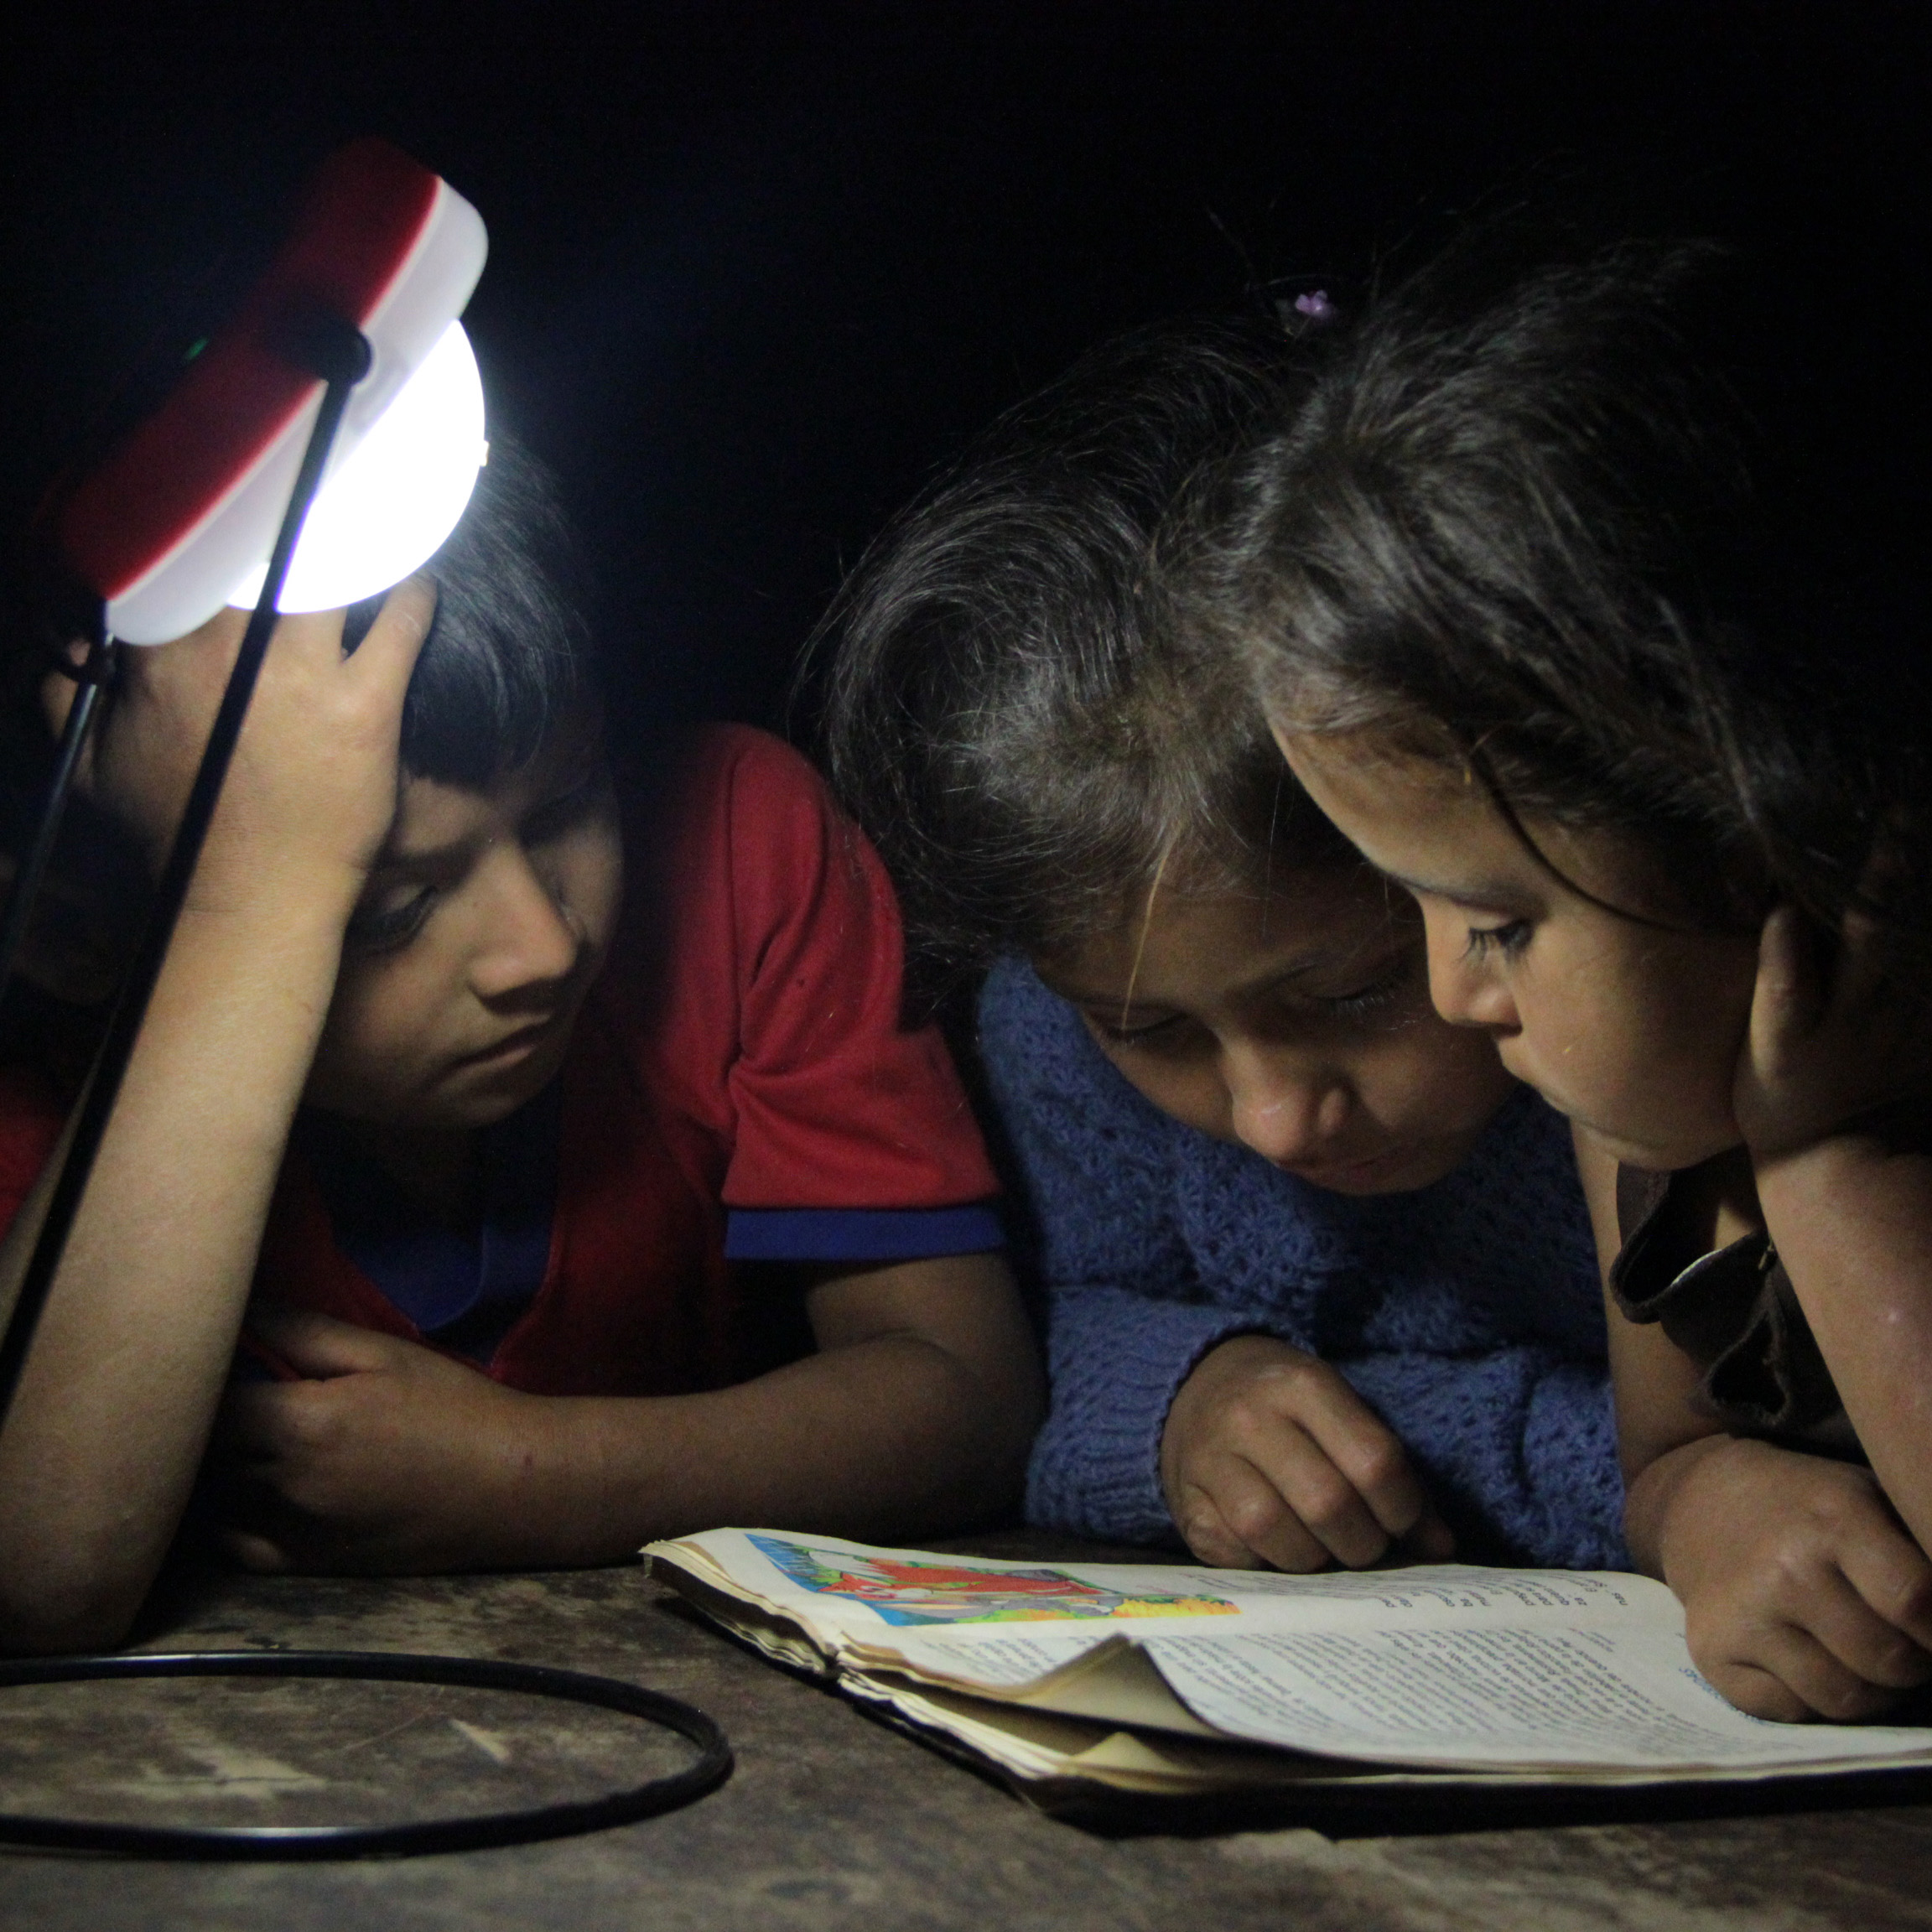 Kids reading - dimensiones ajustados